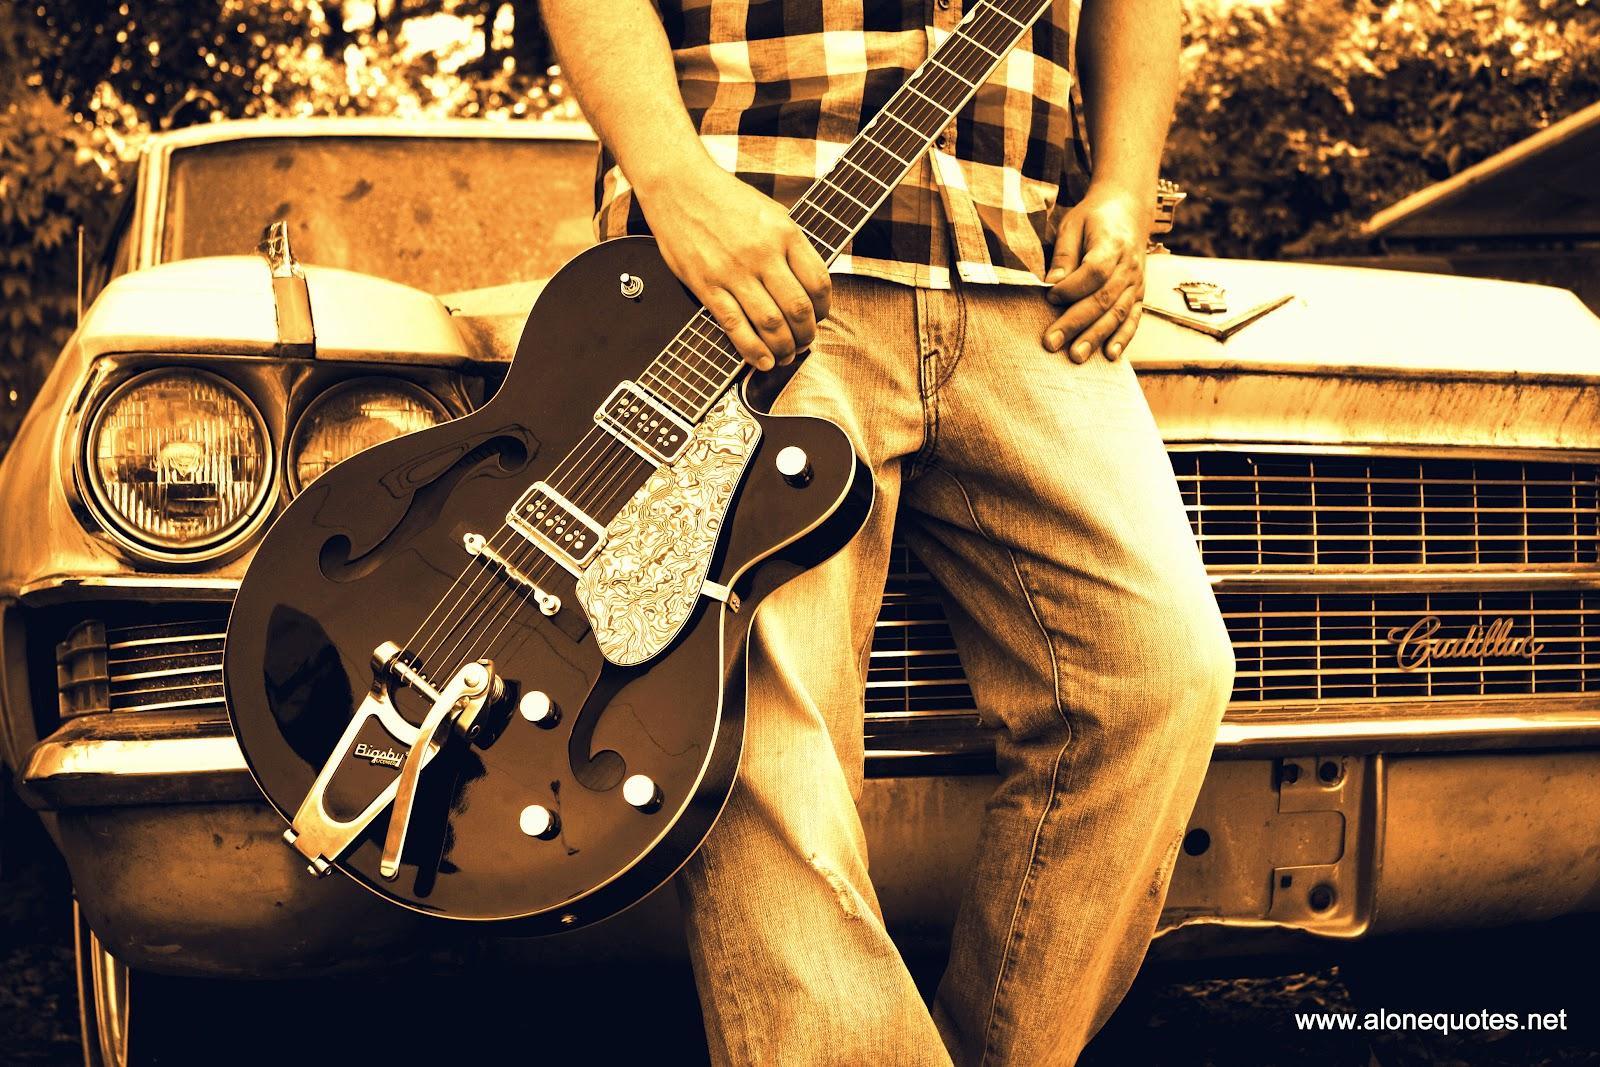 Alone Boy Wallpaper With Guitar Dark Brown Evening